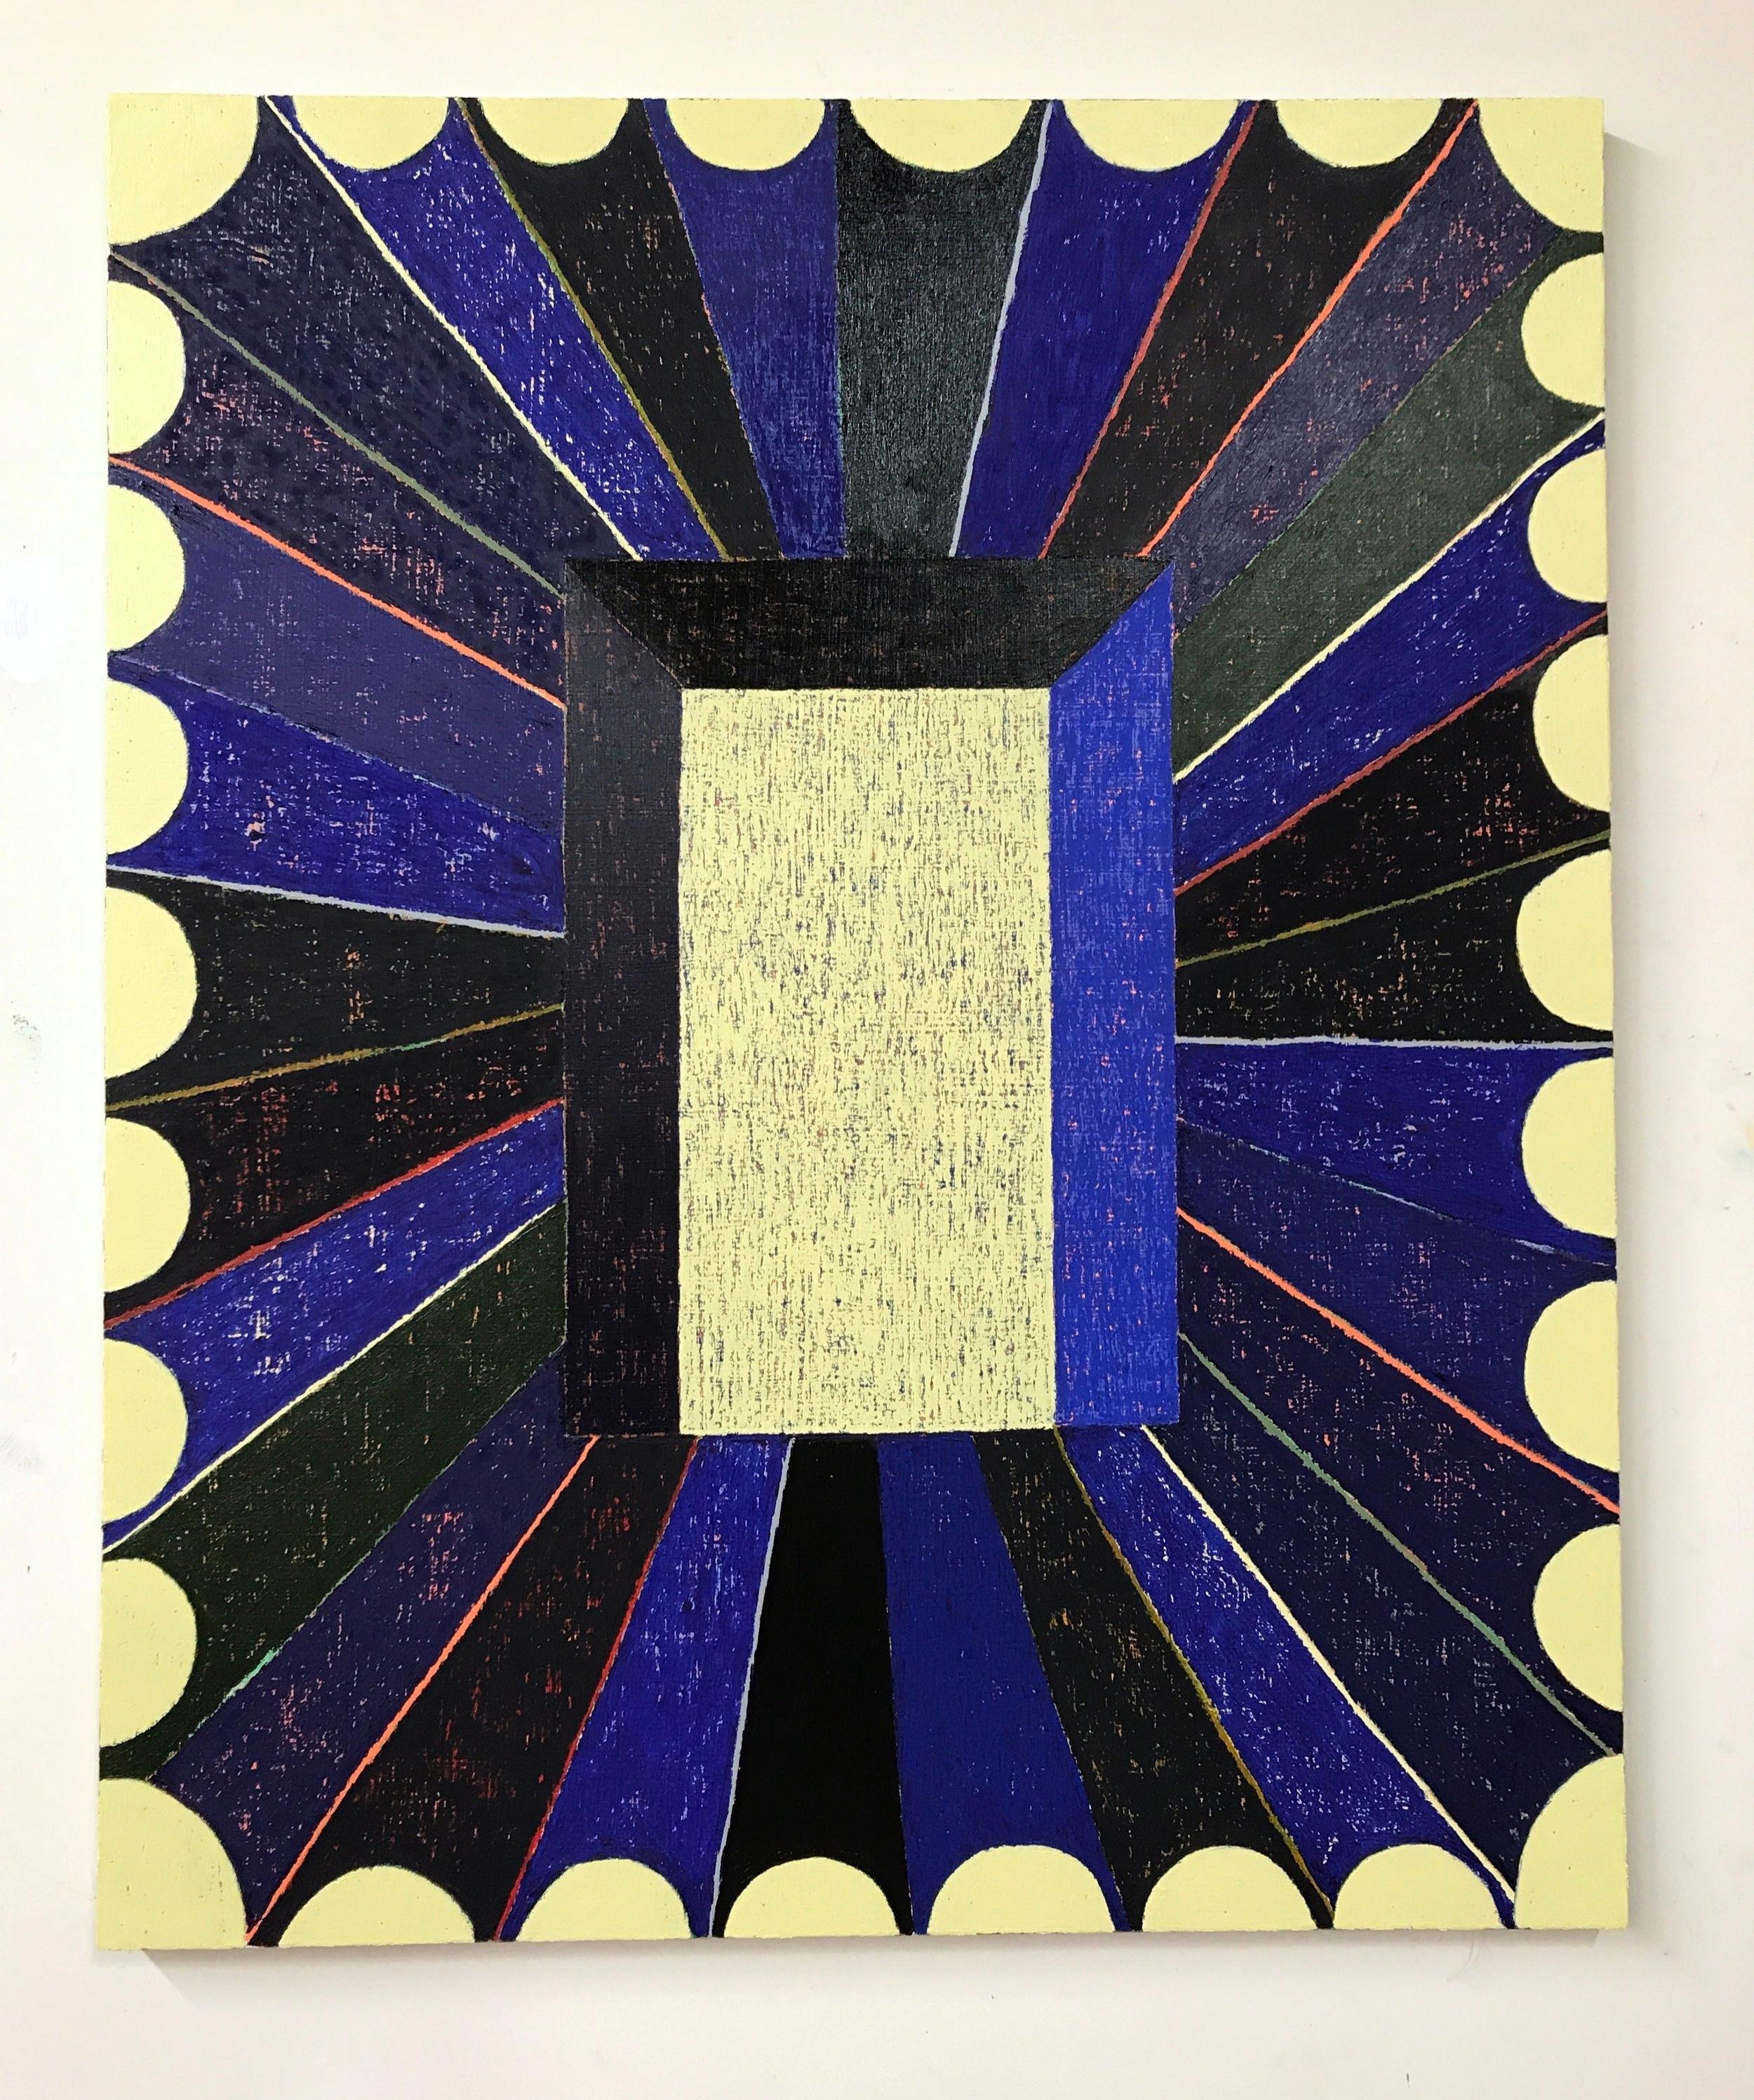 Matt Kleberg,Split Timbre,2017,oil stick on canvas,44 x 36 inches